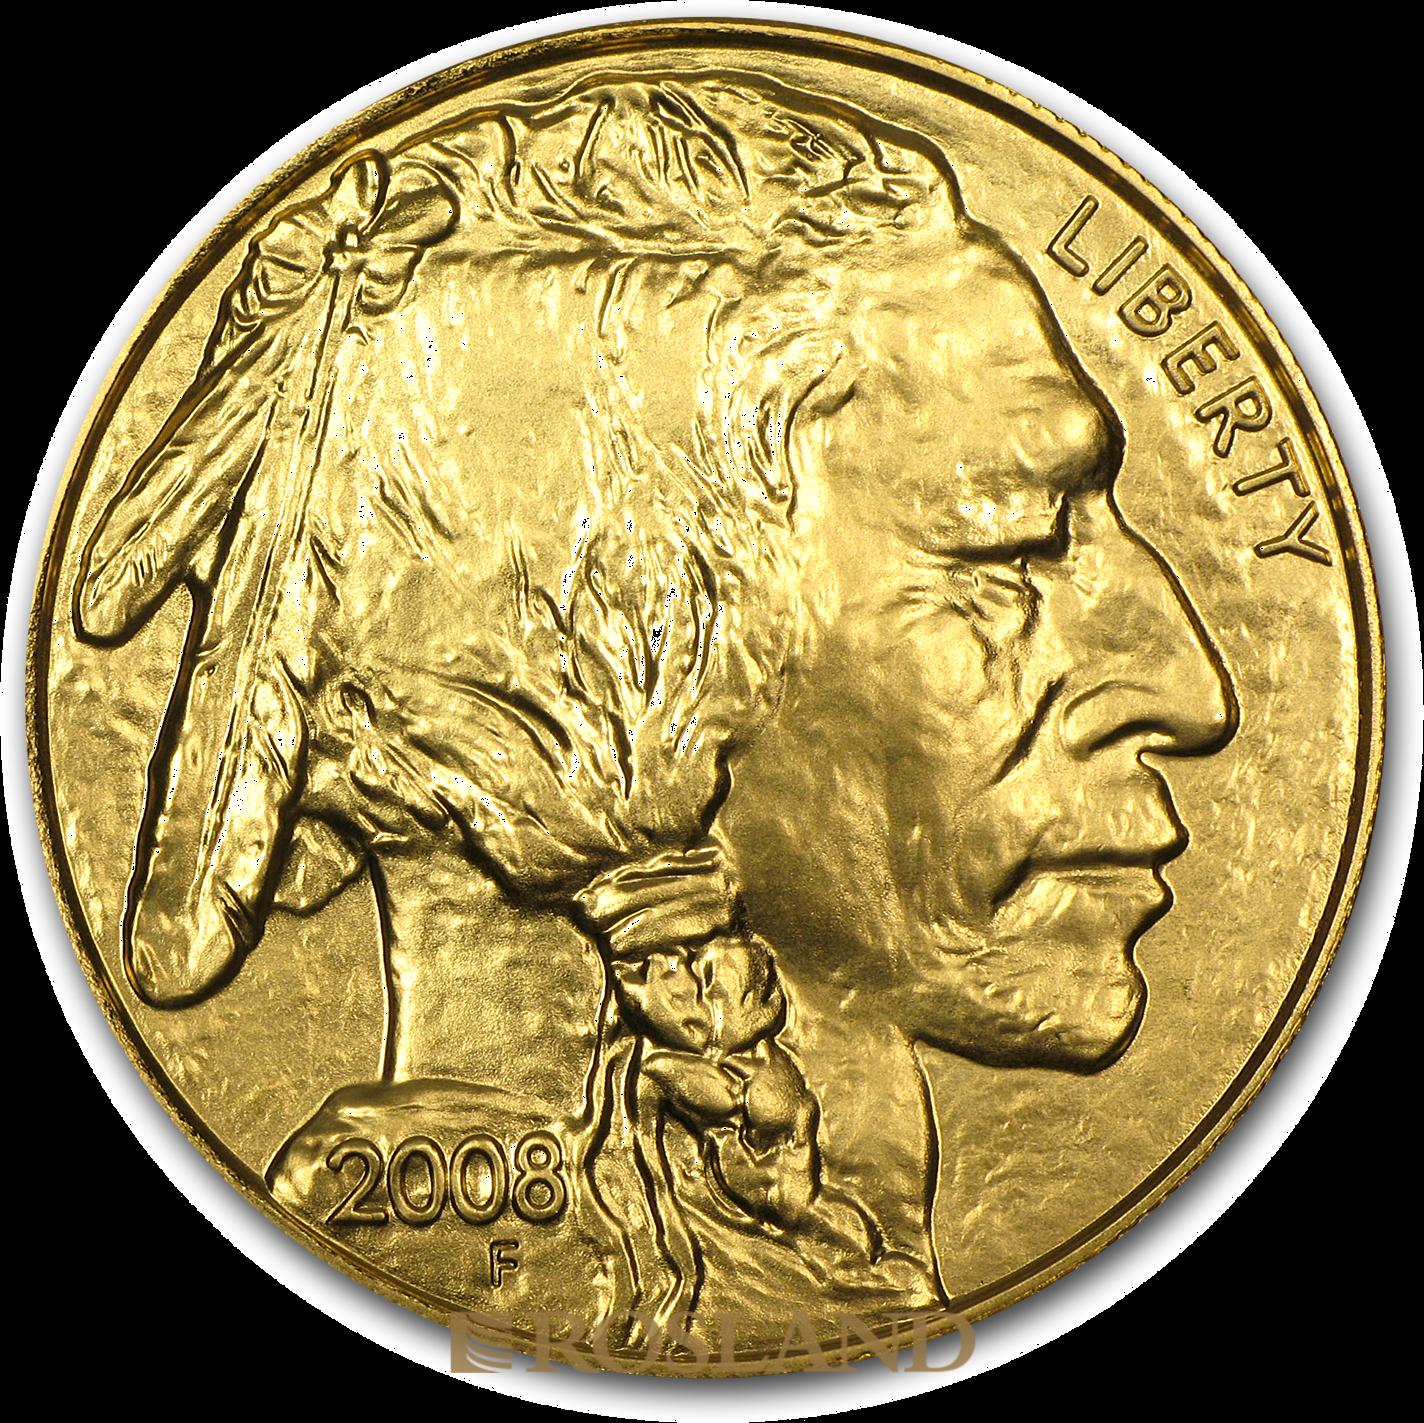 1 Unze Goldmünze American Buffalo 2008